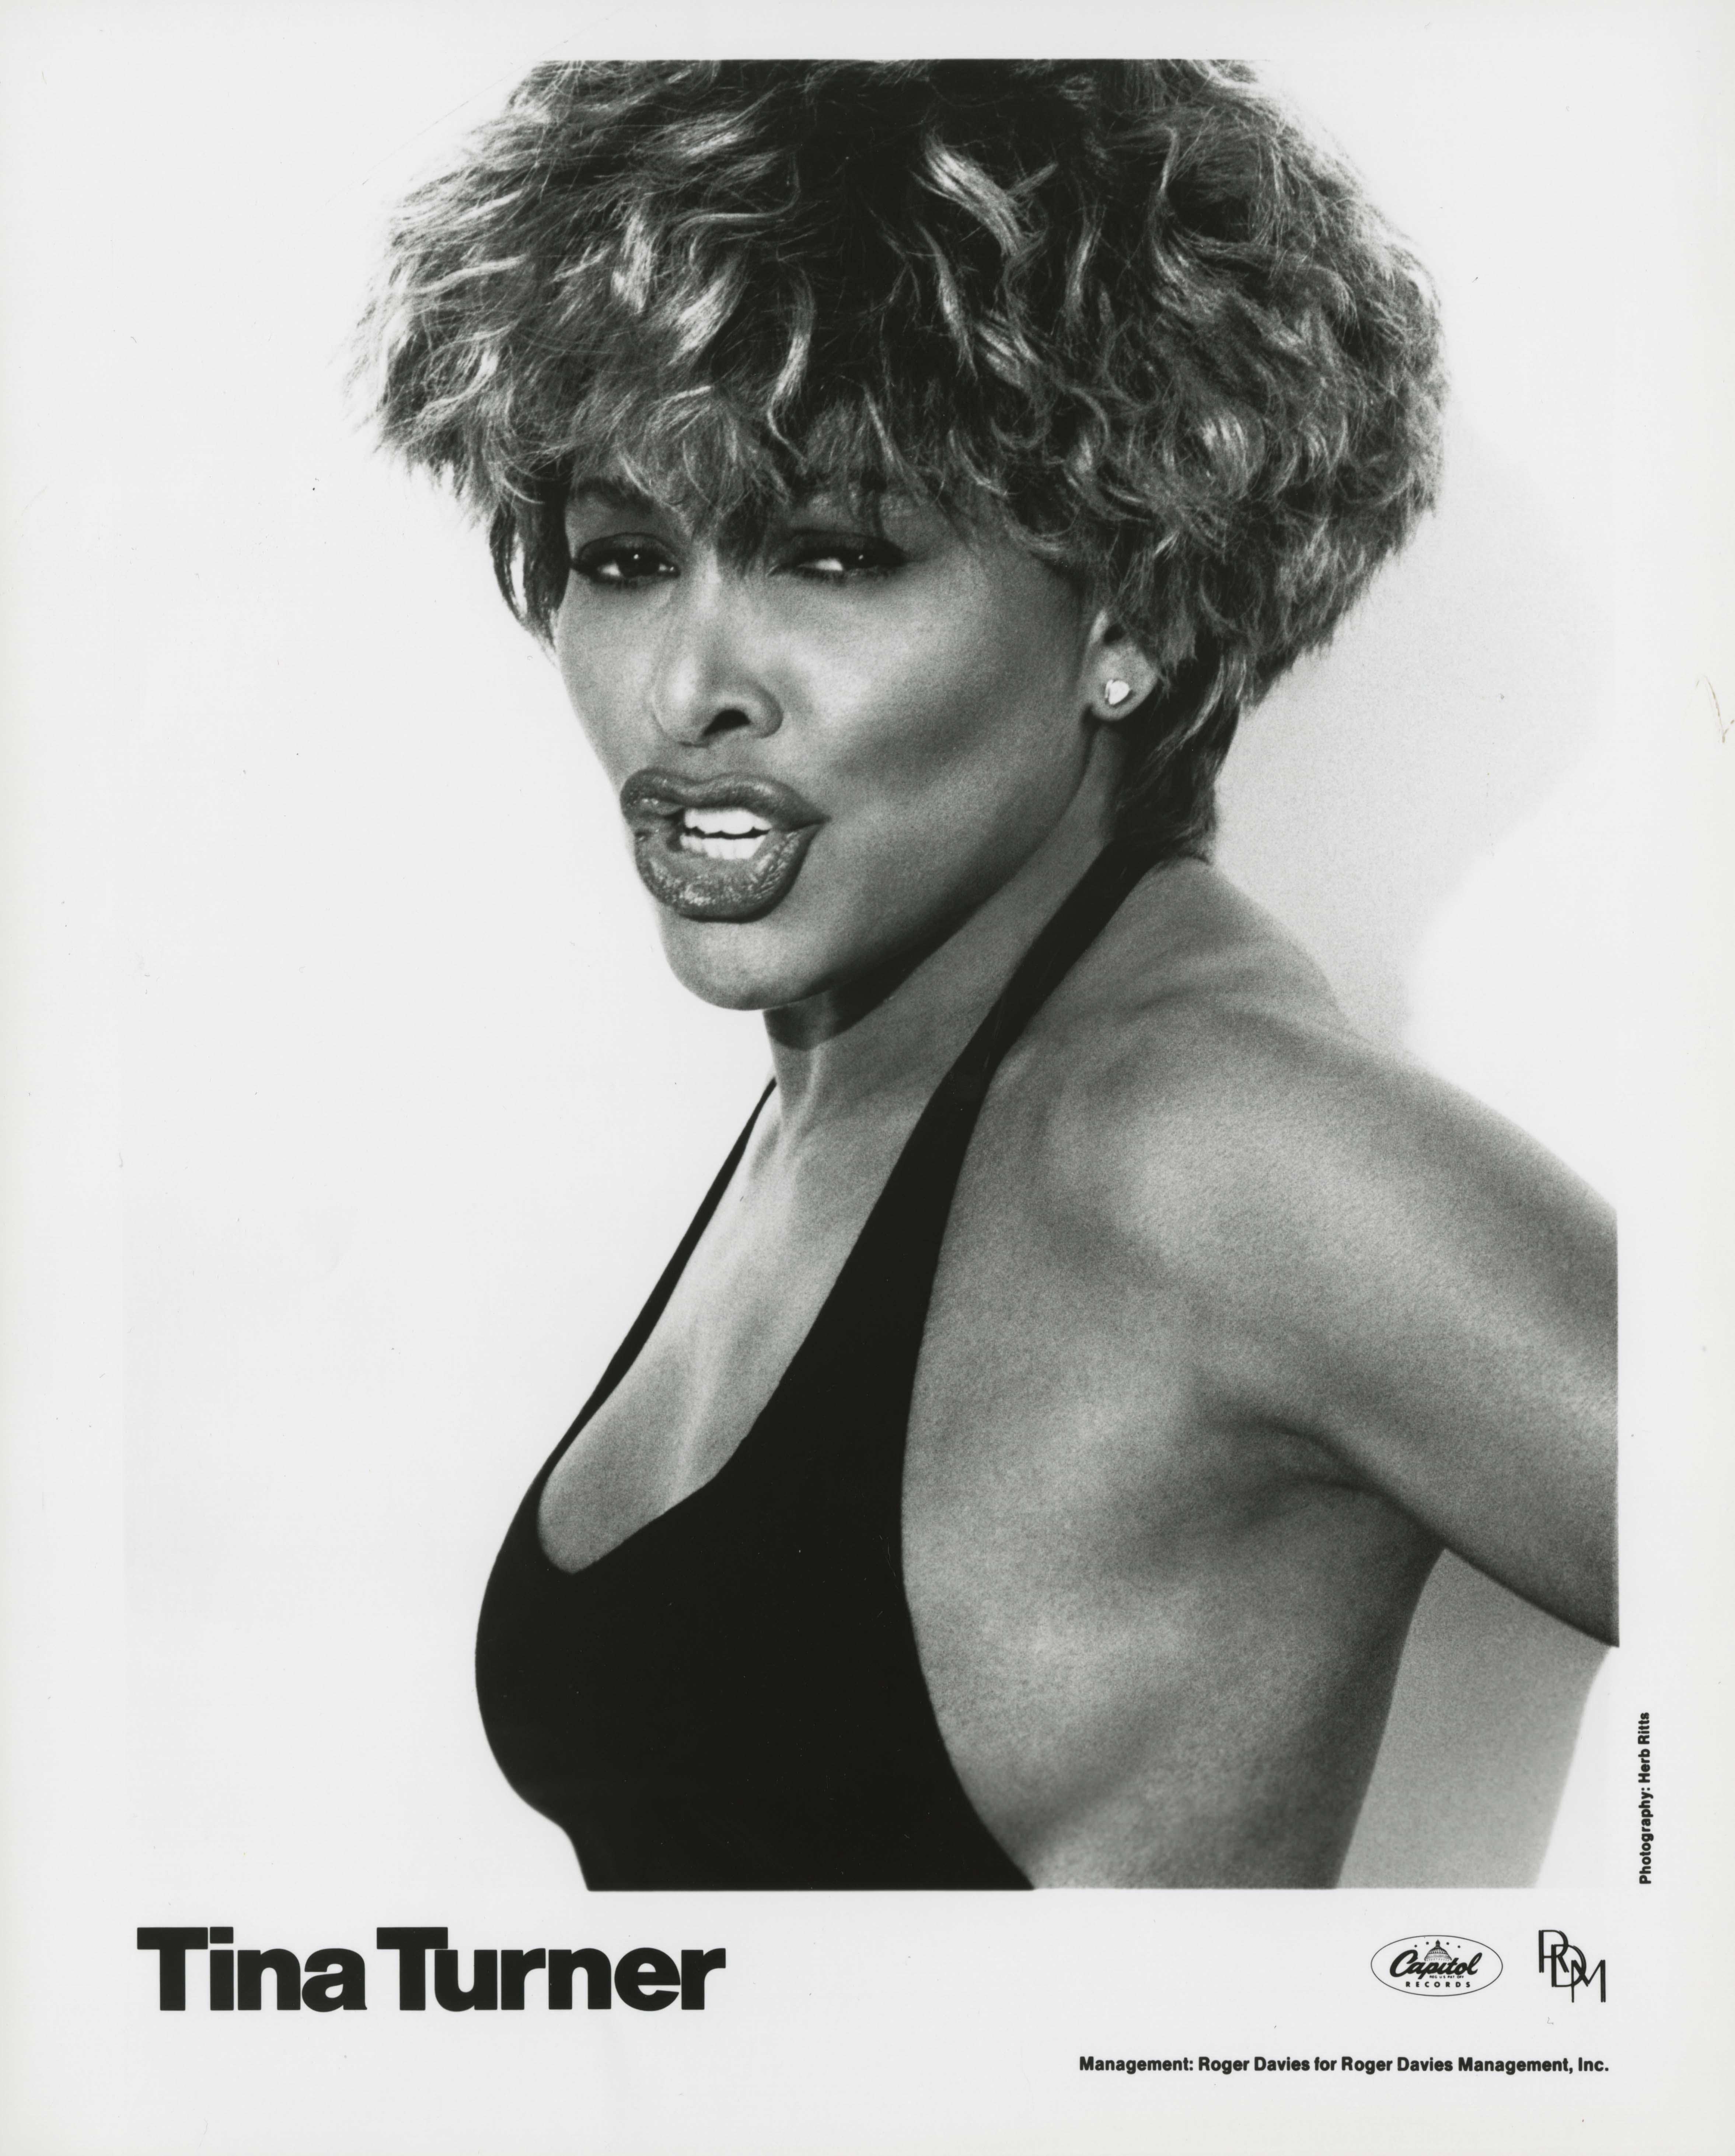 Tina Turner promo photo